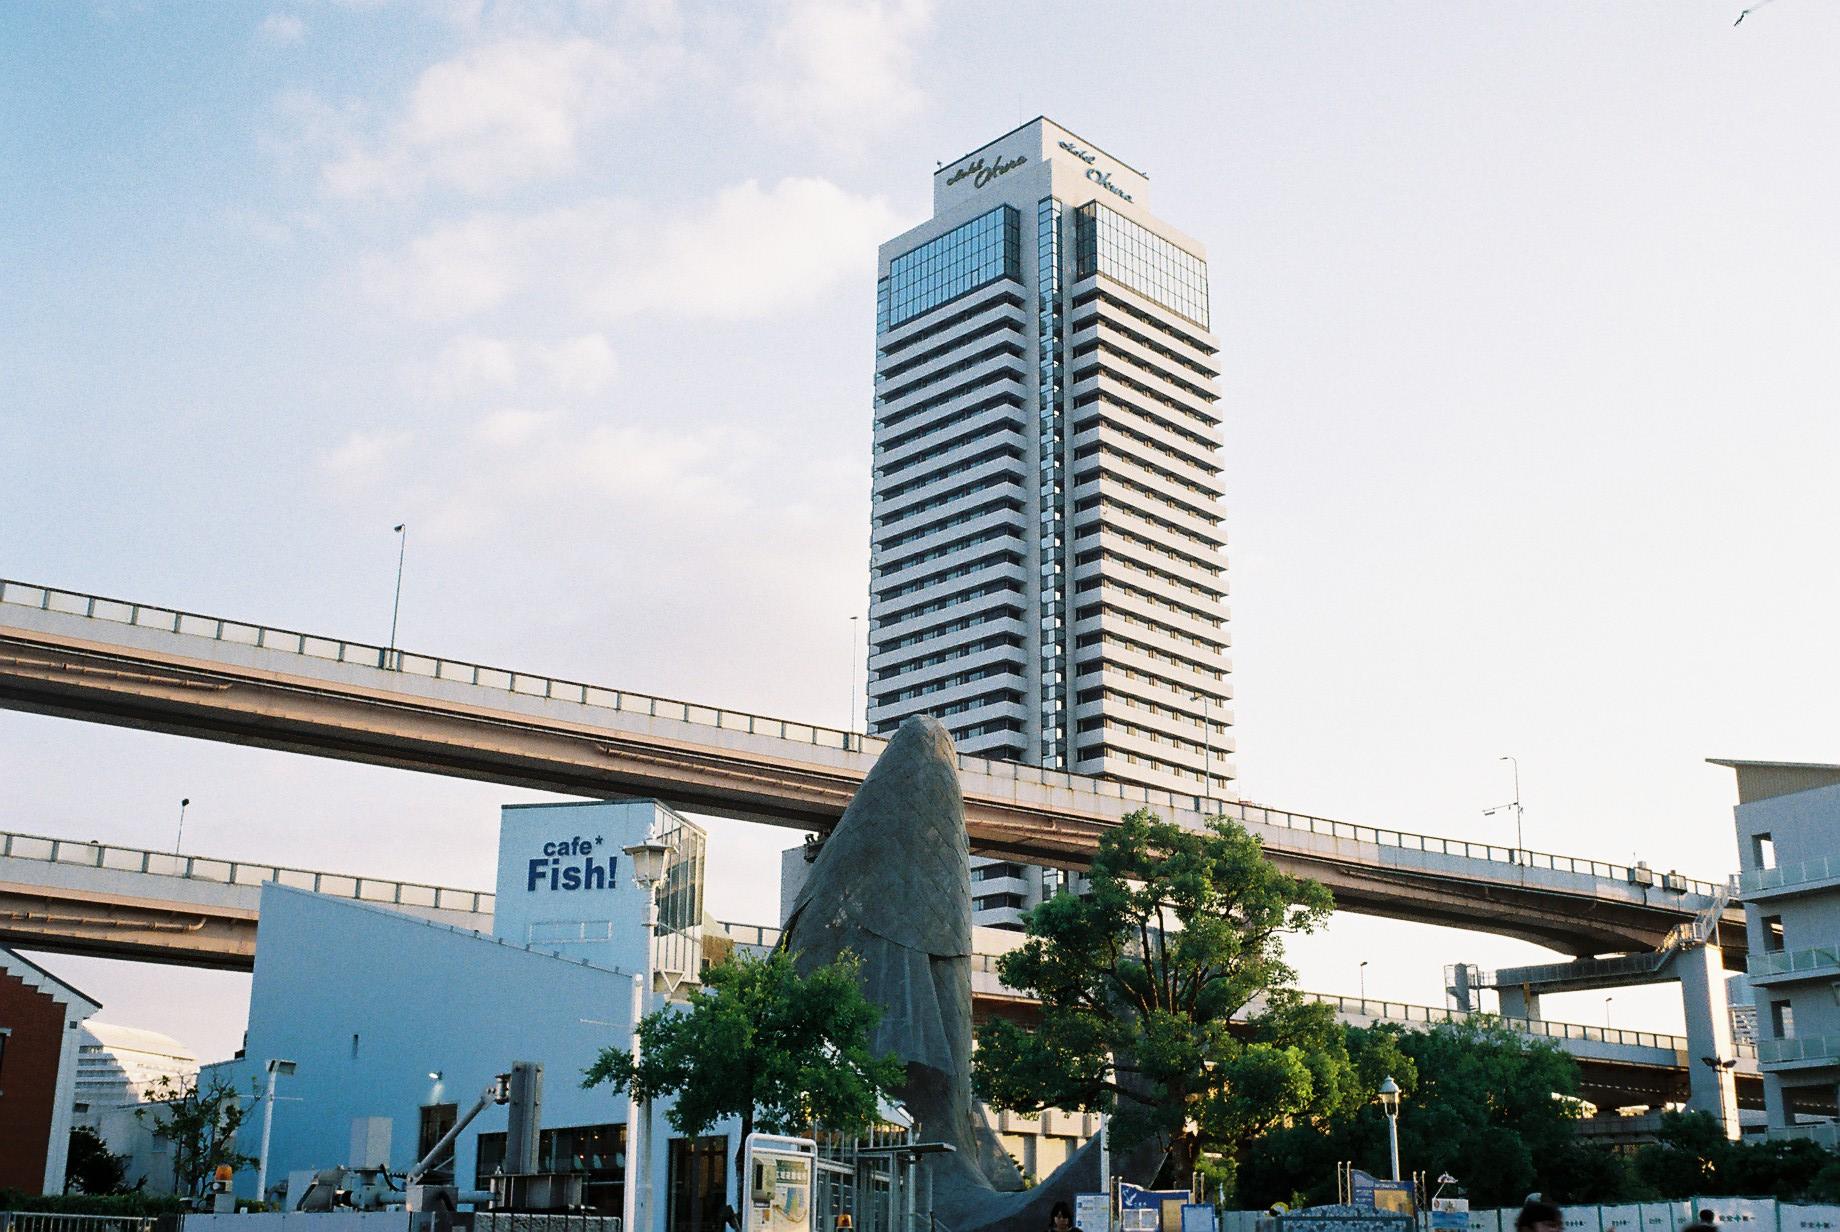 06-JAPON-argentic-Kobe-aout-2016-0011.JPG